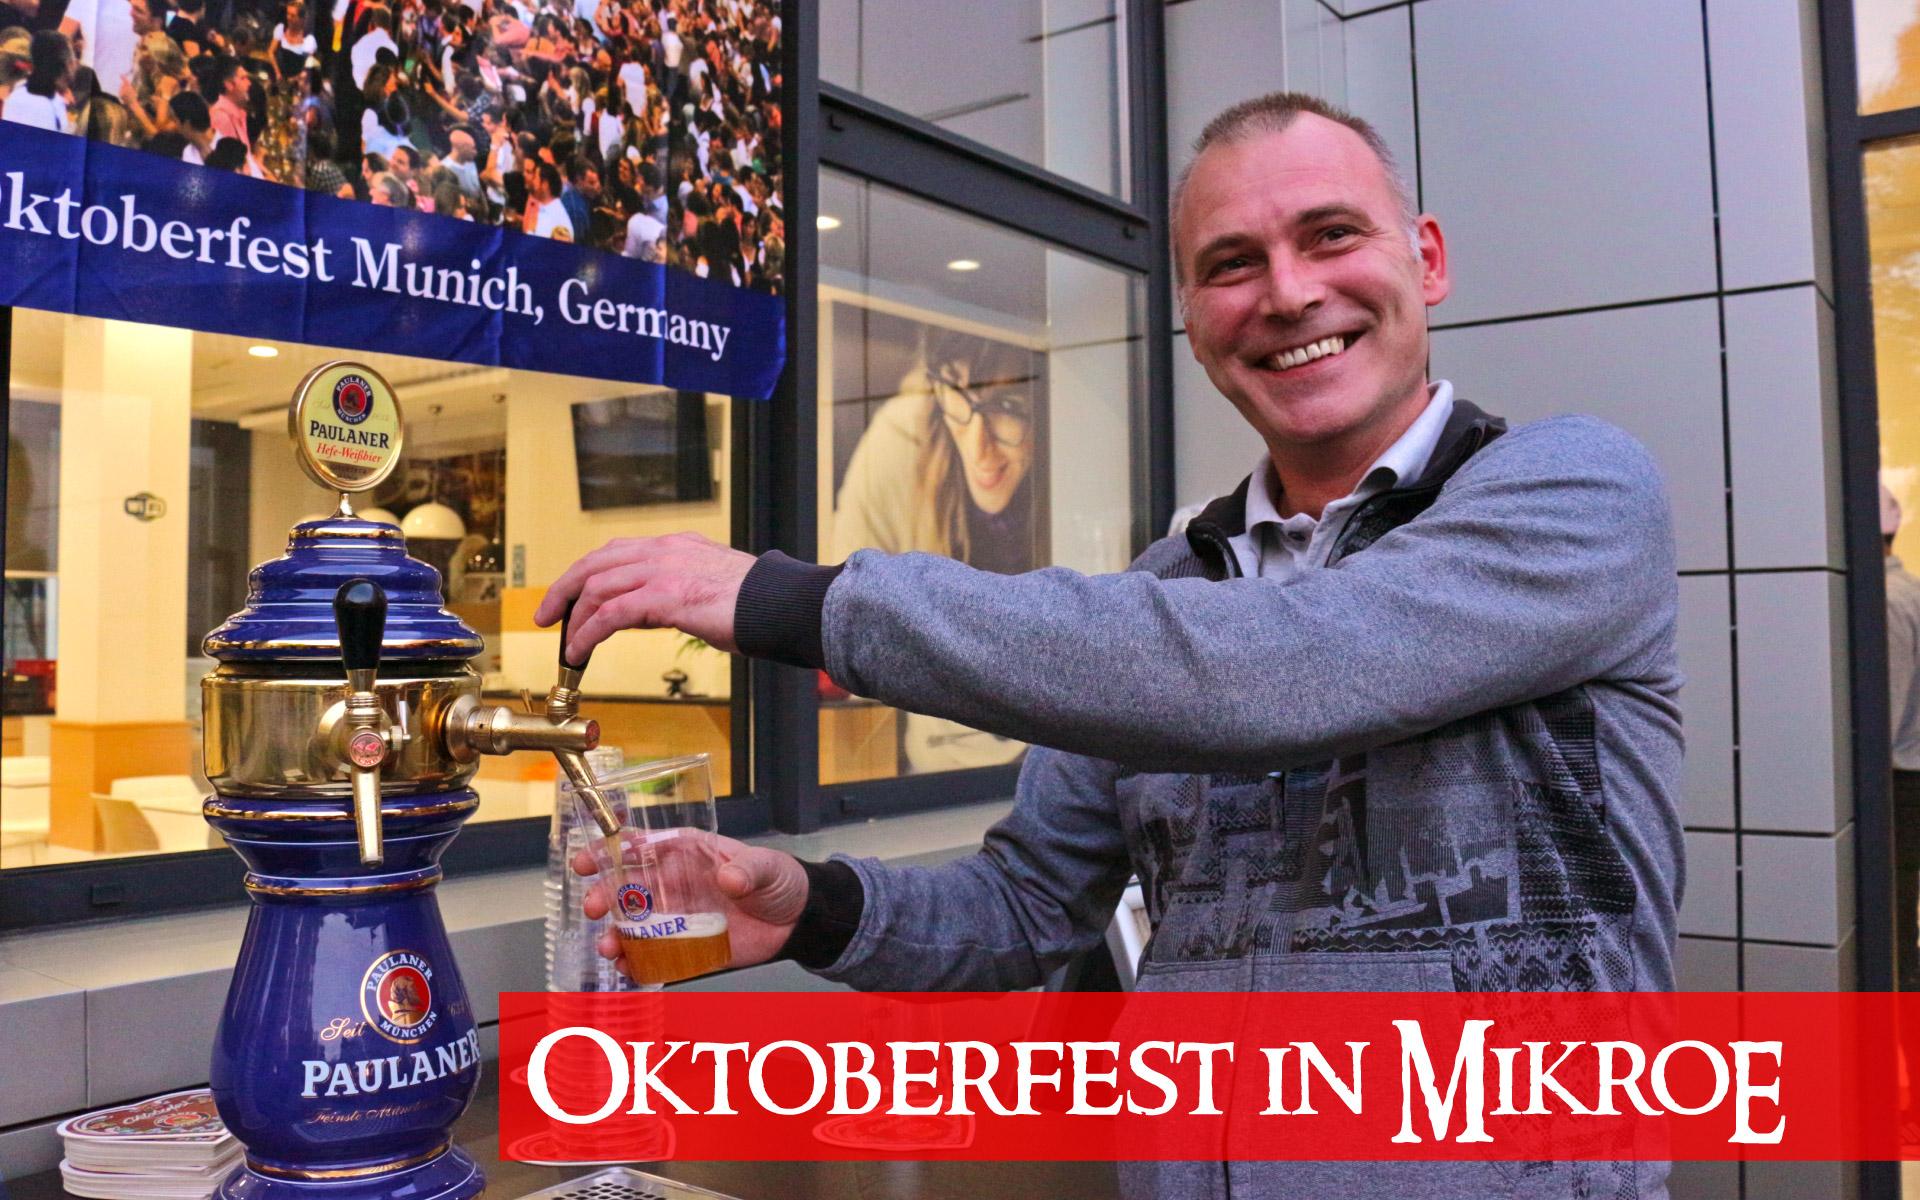 Oktoberfest in MikroElektronika - the best autumn party